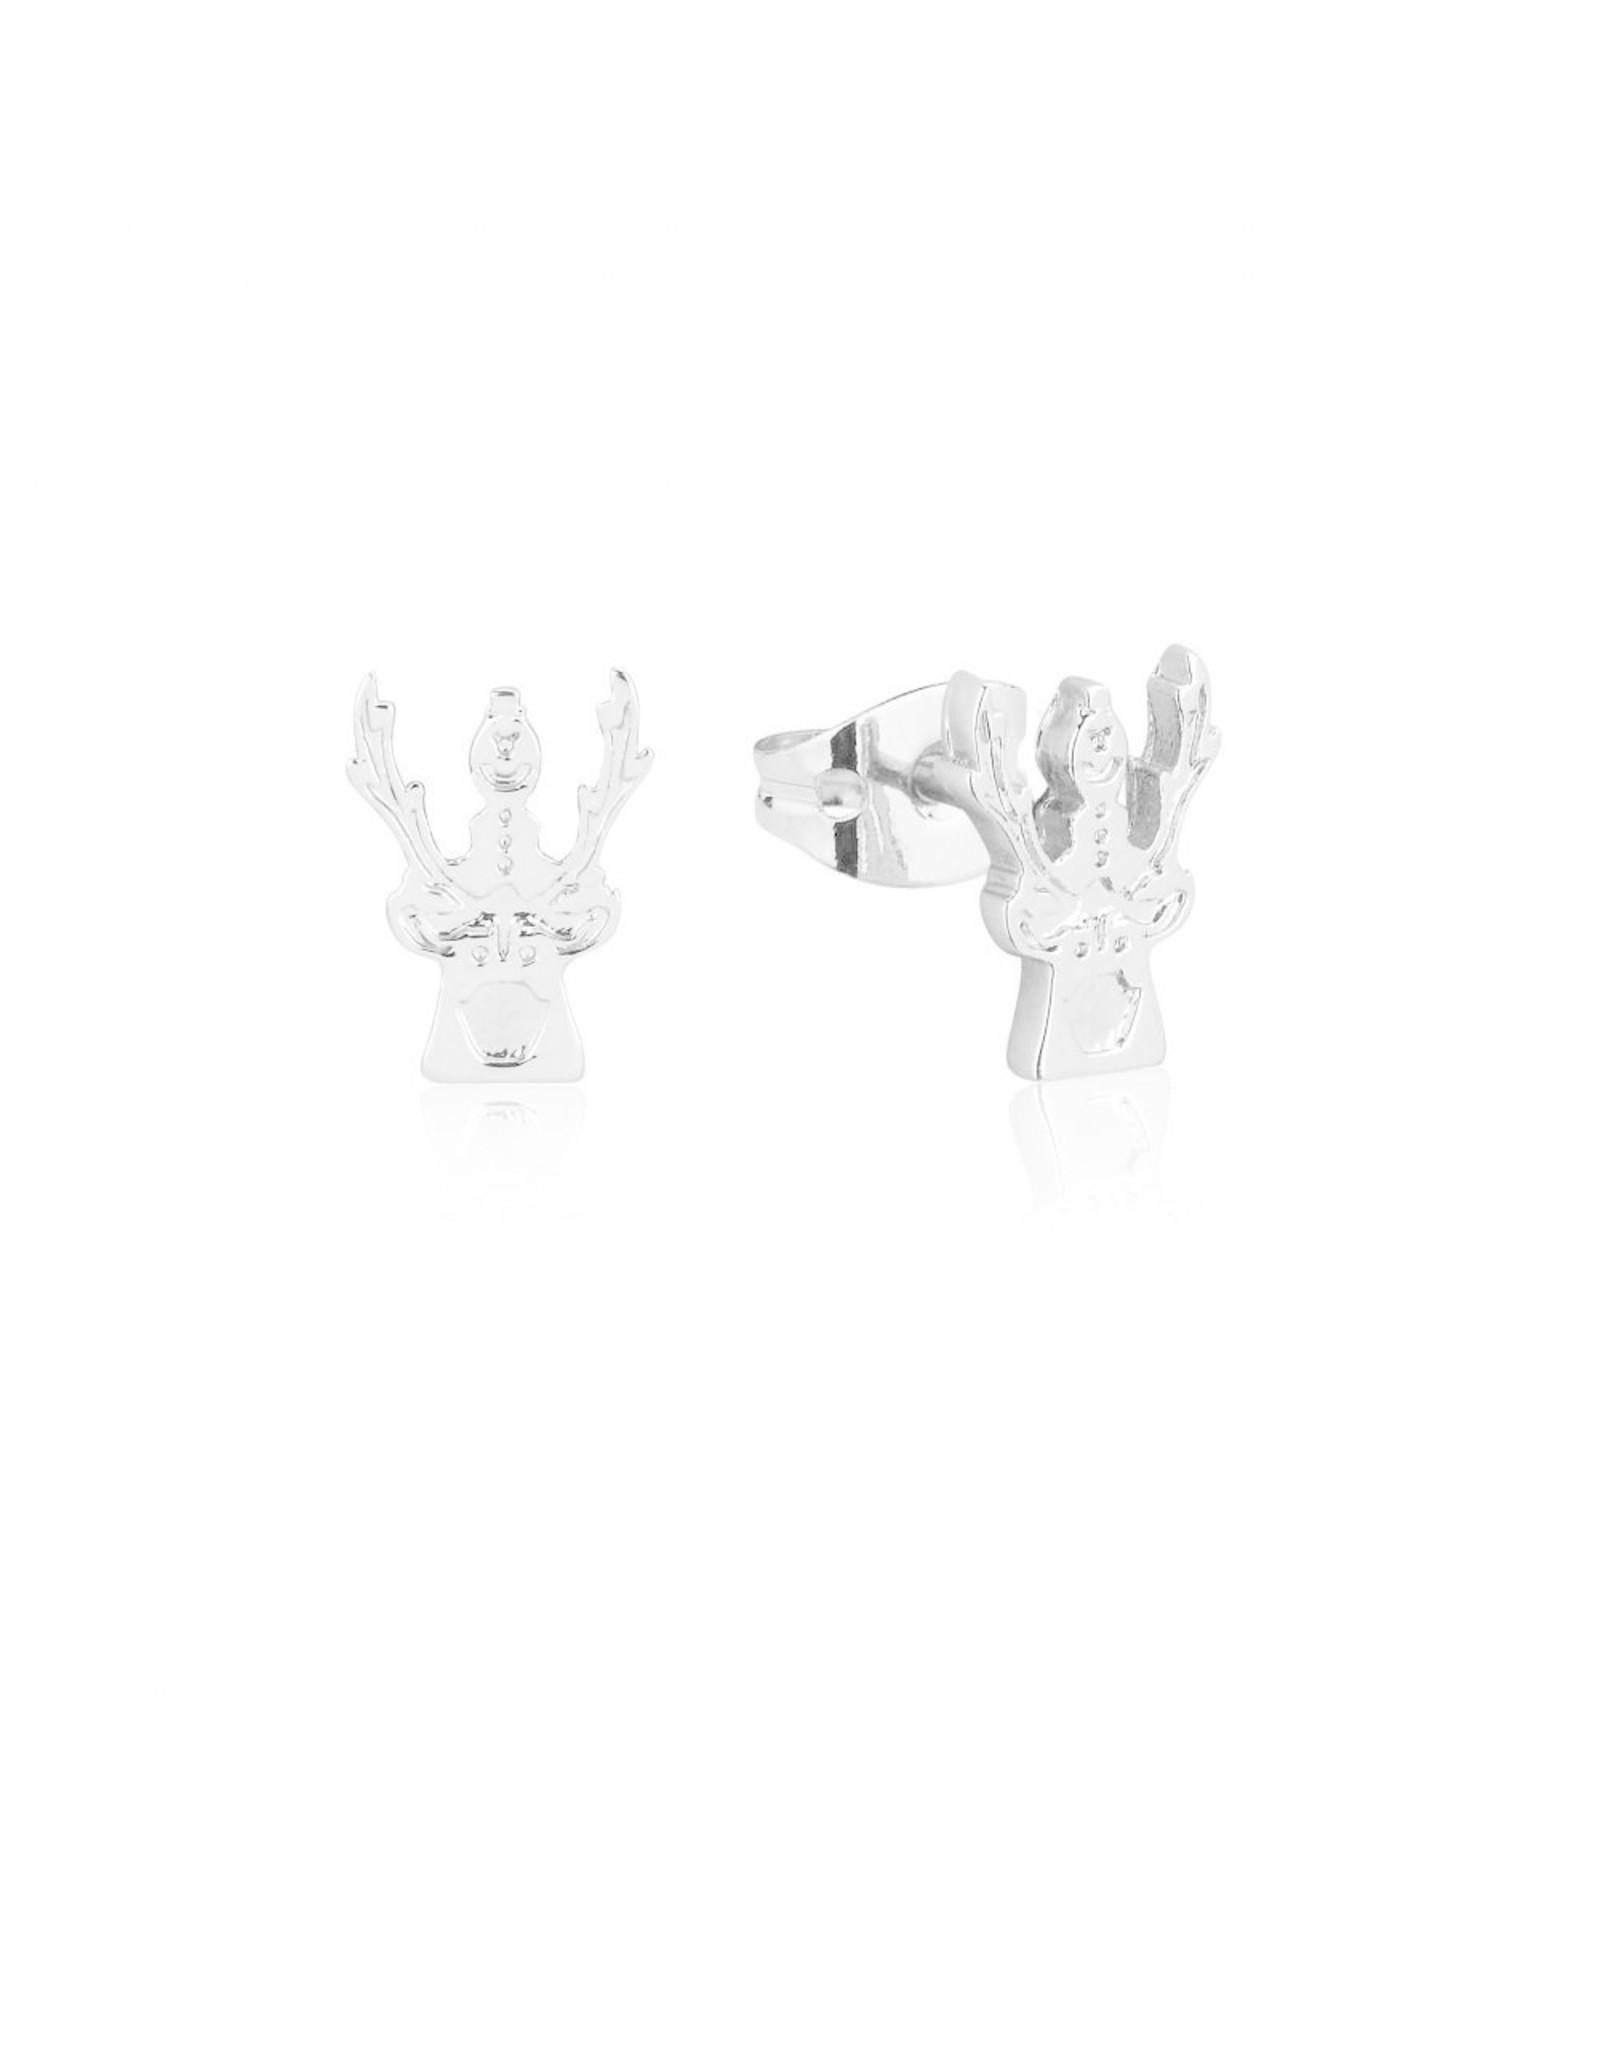 FROZEN 2 - Olaf & Sven Stud Earrings 'White Gold Plated'